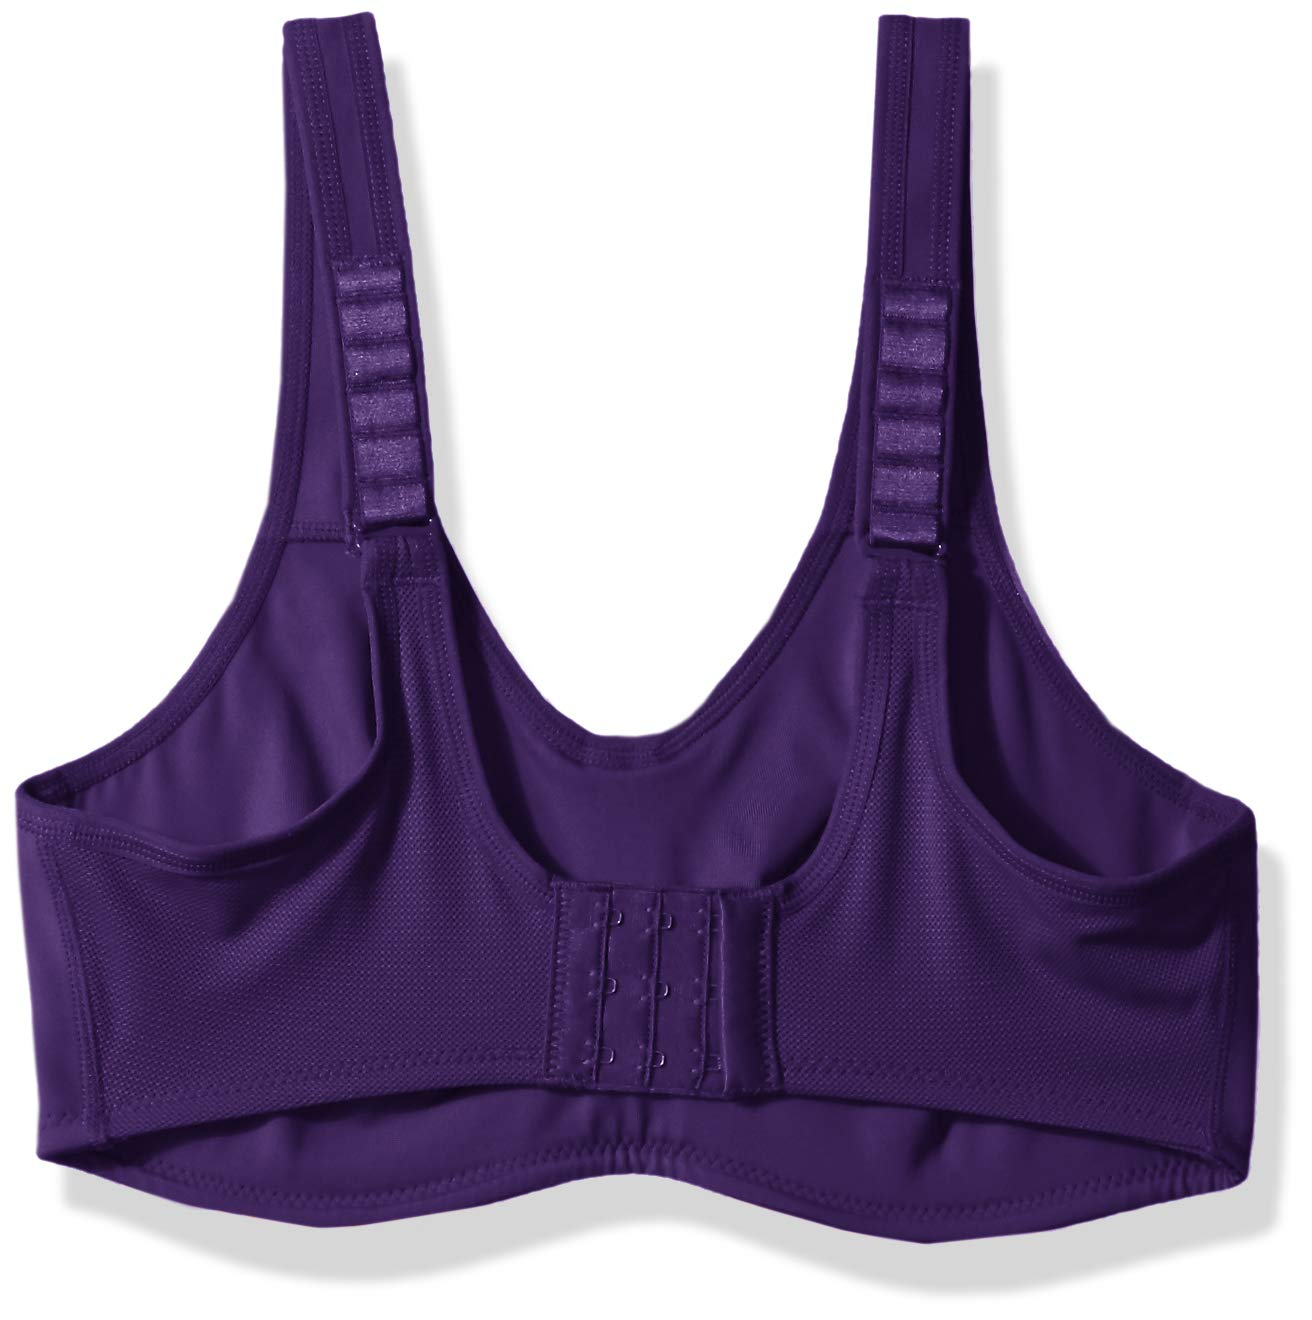 Wacoal Women's Plus-Size Sport Underwire Bra Bra, Violet Indigo, 32D by Wacoal (Image #2)